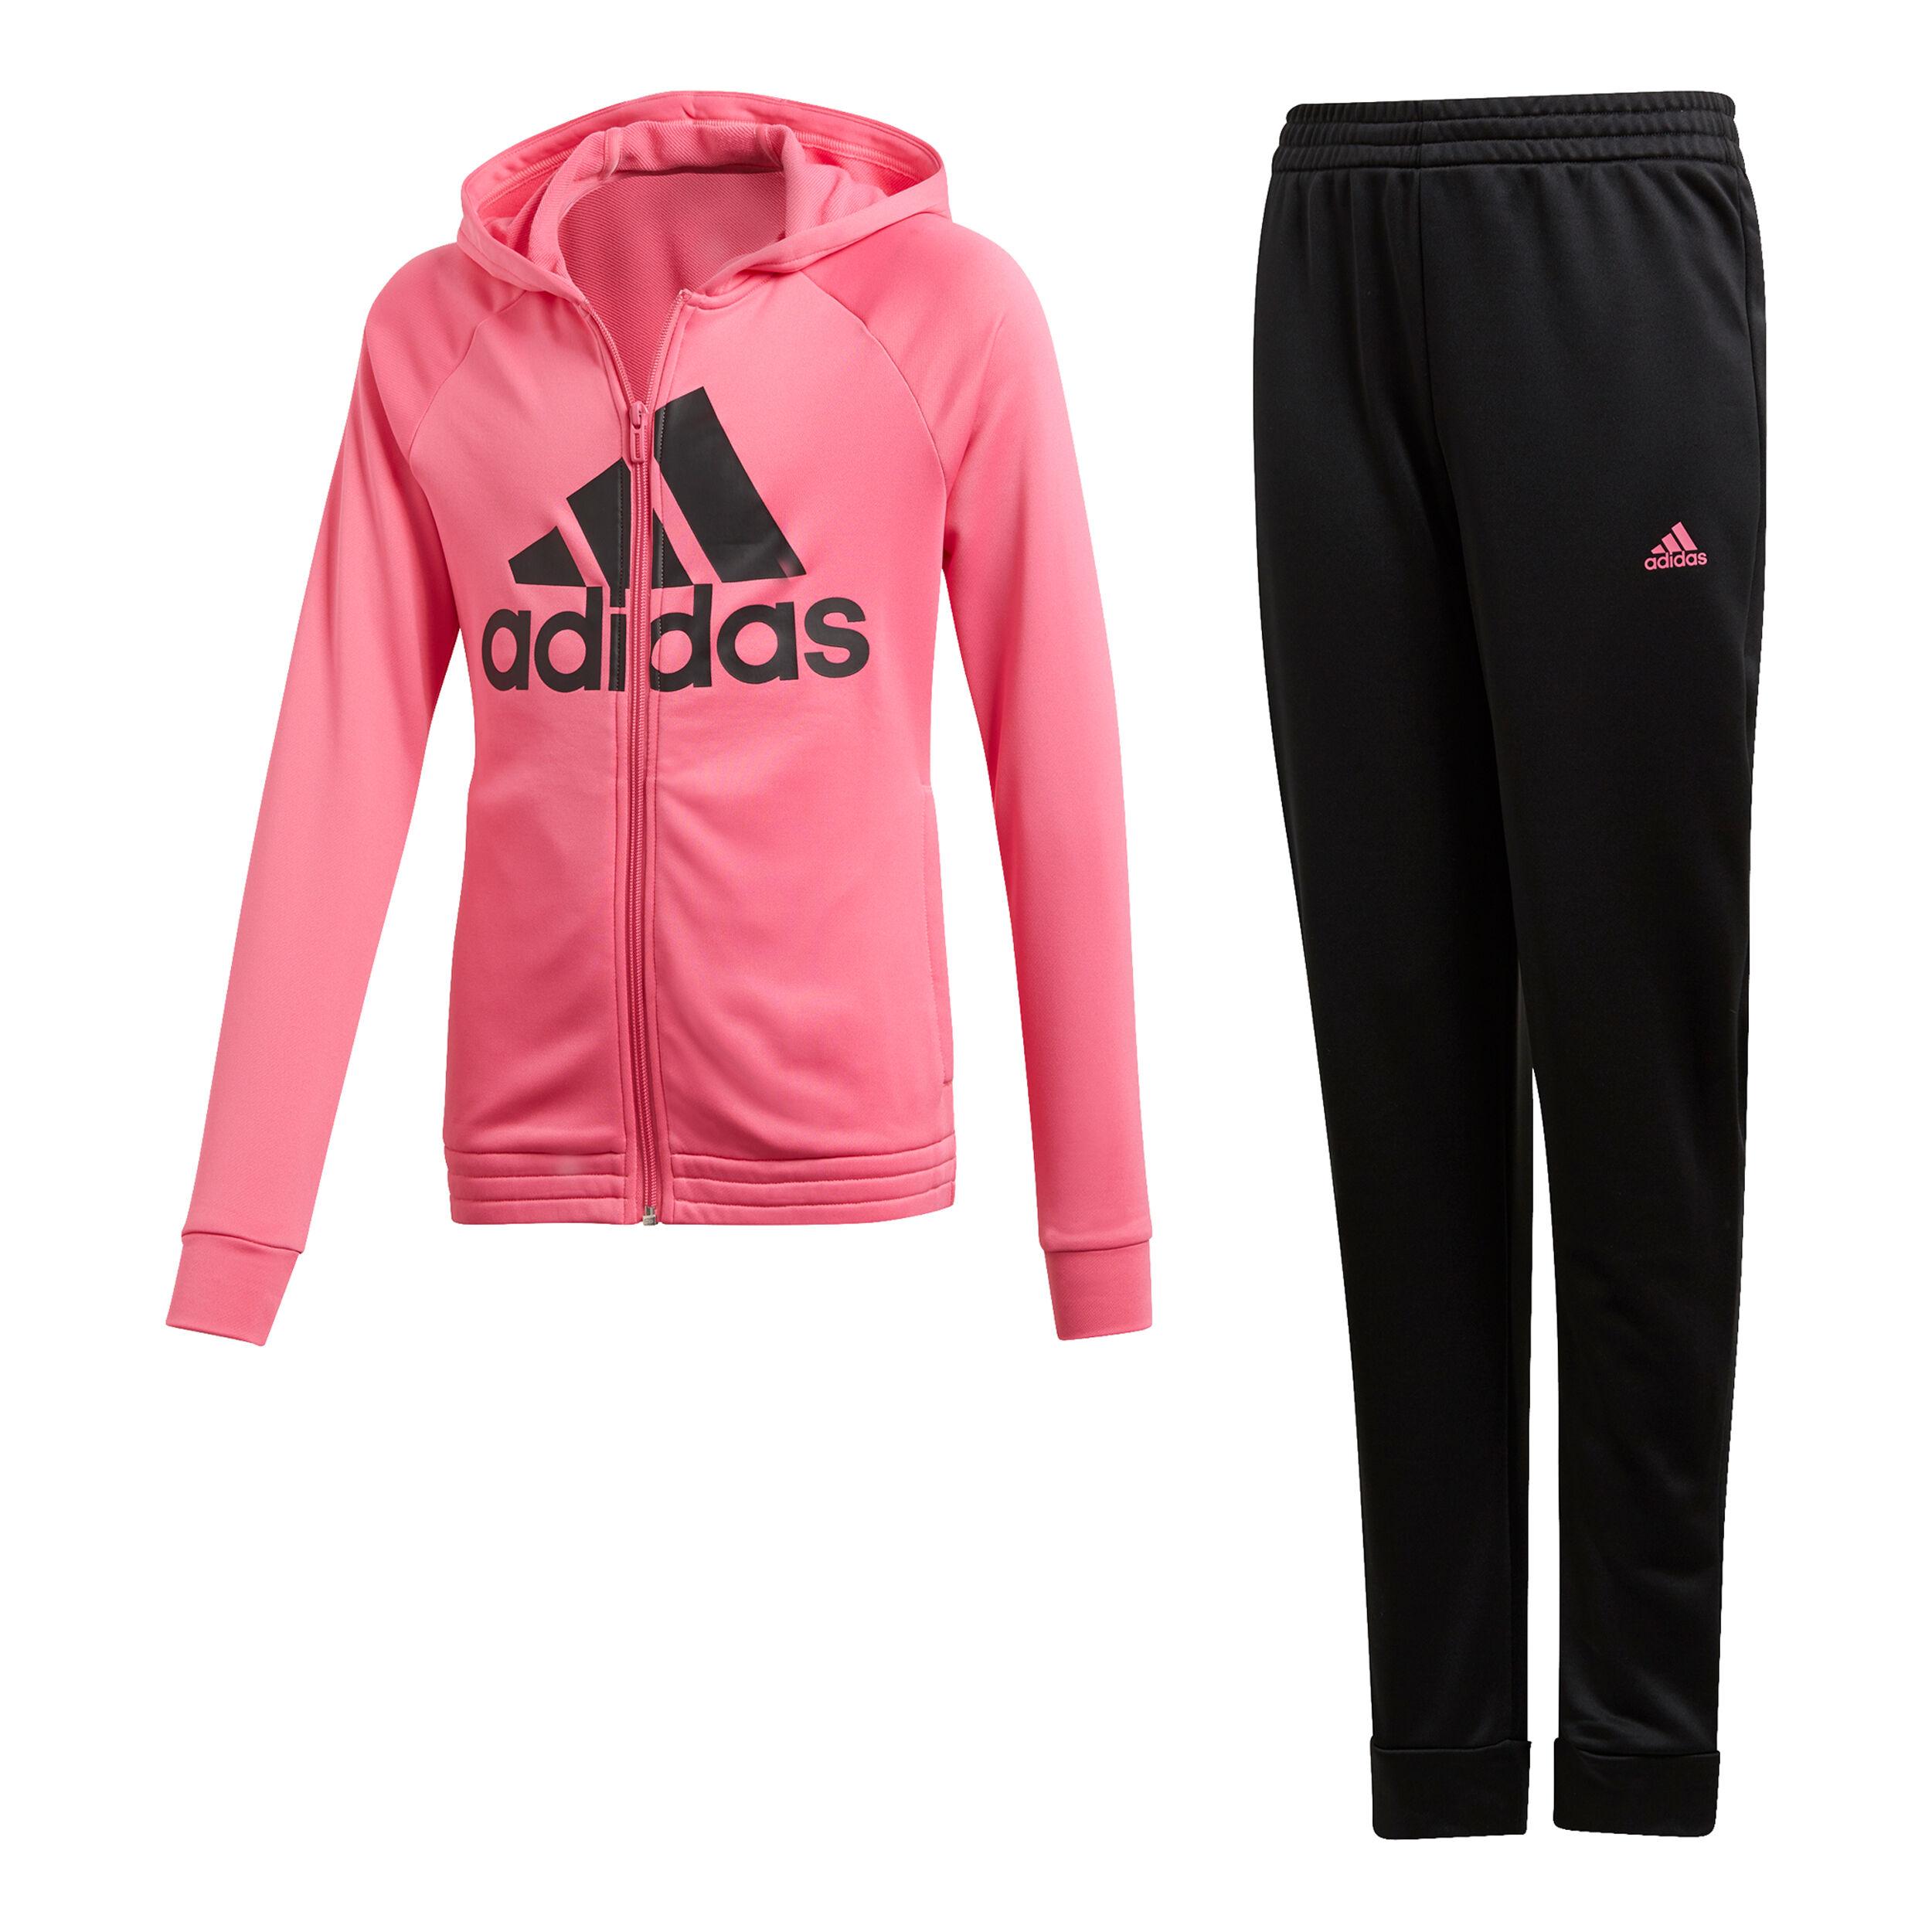 adidas Hooded Polyester Trainingsanzug Mädchen Schwarz